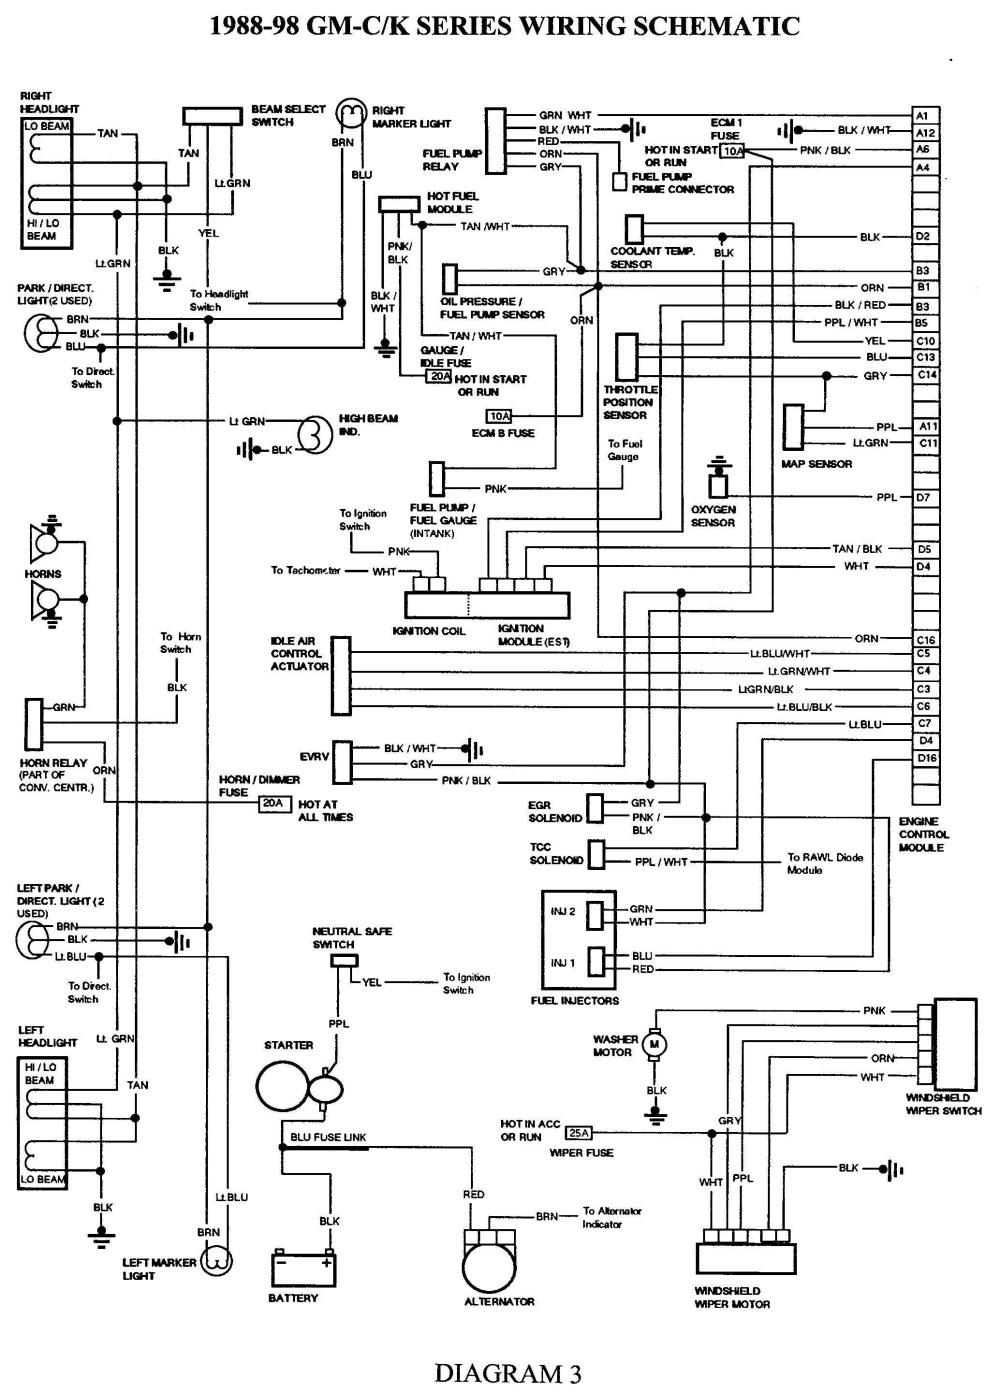 medium resolution of 2001 chevy impala 3 8 engine diagram 1992 caprice 5 7 engine wiring harness mastering wiring